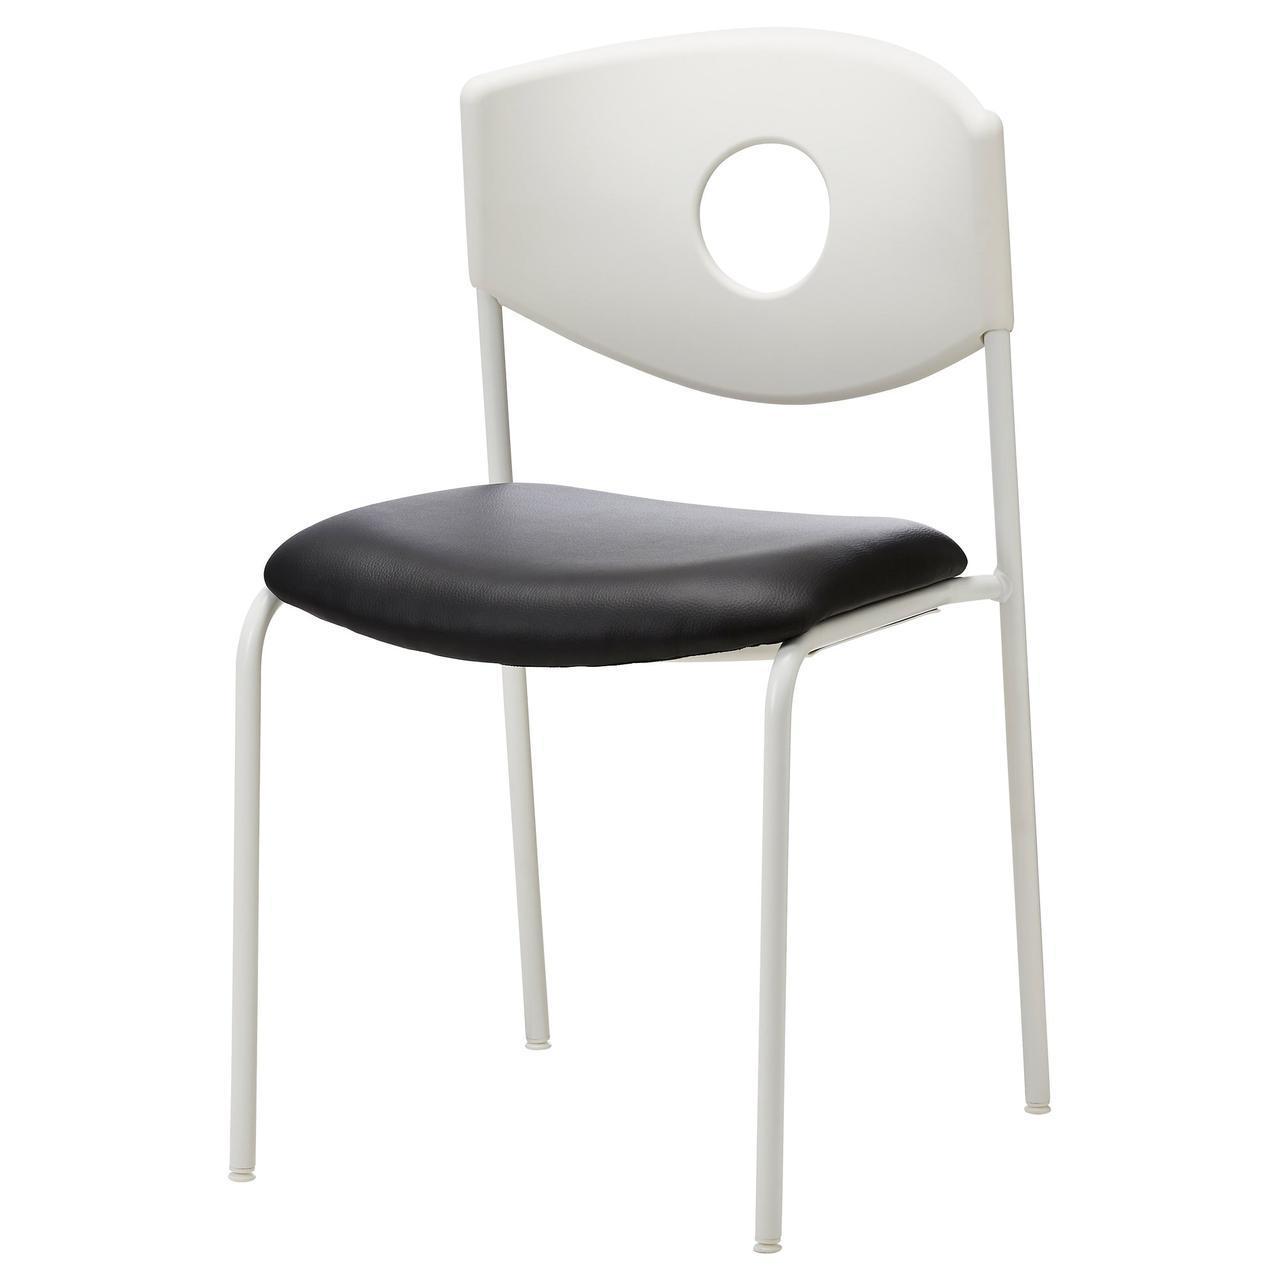 IKEA STOLJAN (899.074.52) Стул для конференций, белый, черный